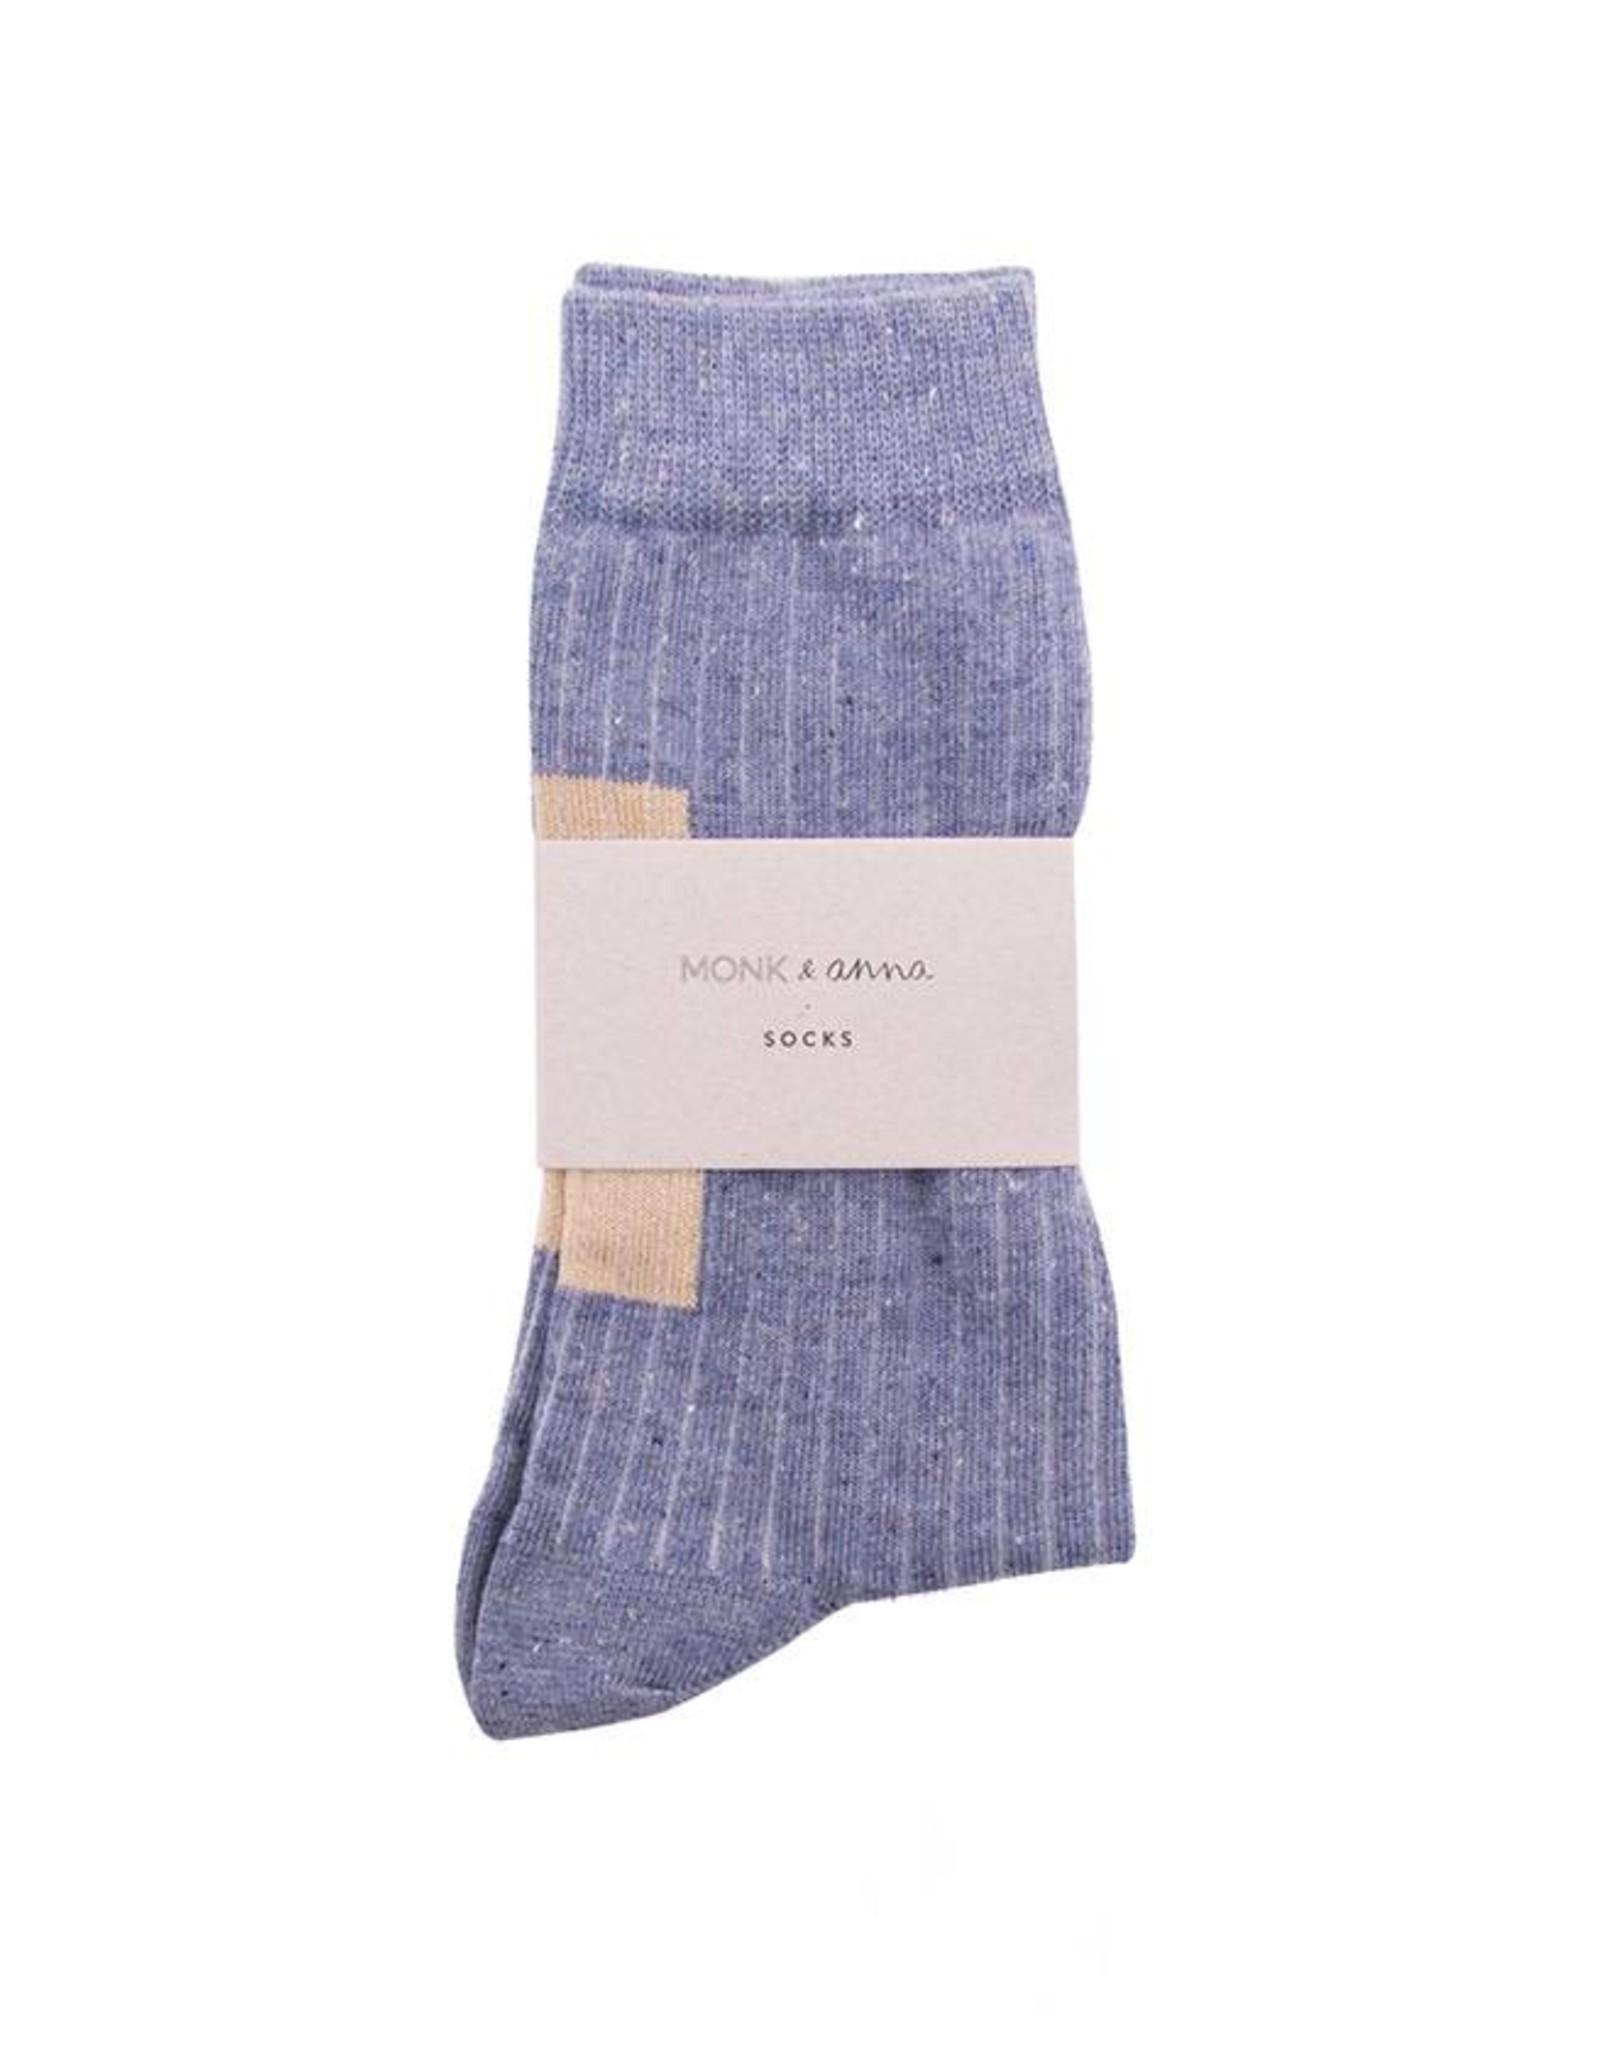 Monk & Anna Socks WOMAN Glitter Stripes-greyish blue